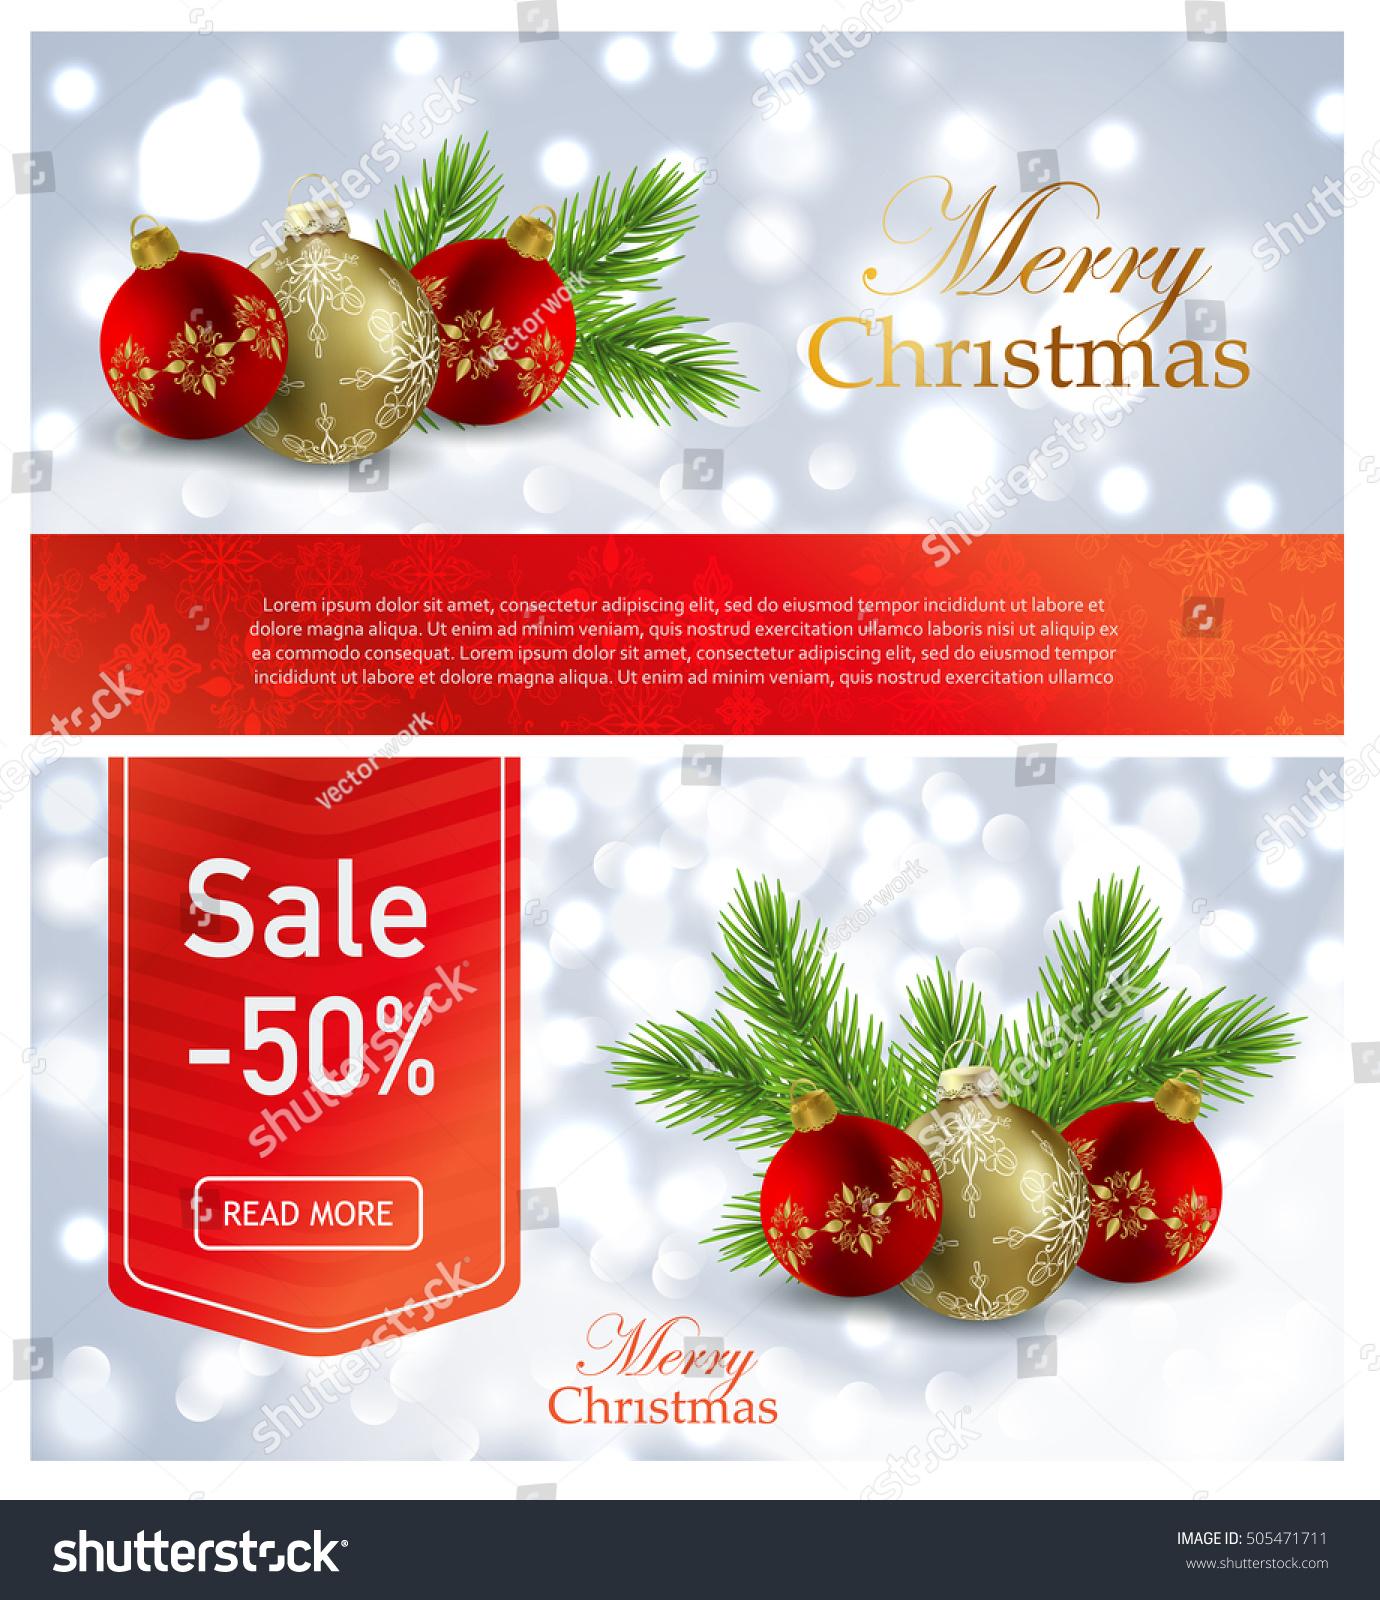 Christmas Discounts Banner Advertising Balls Christmas Stock  - Christmas Tree Discounts